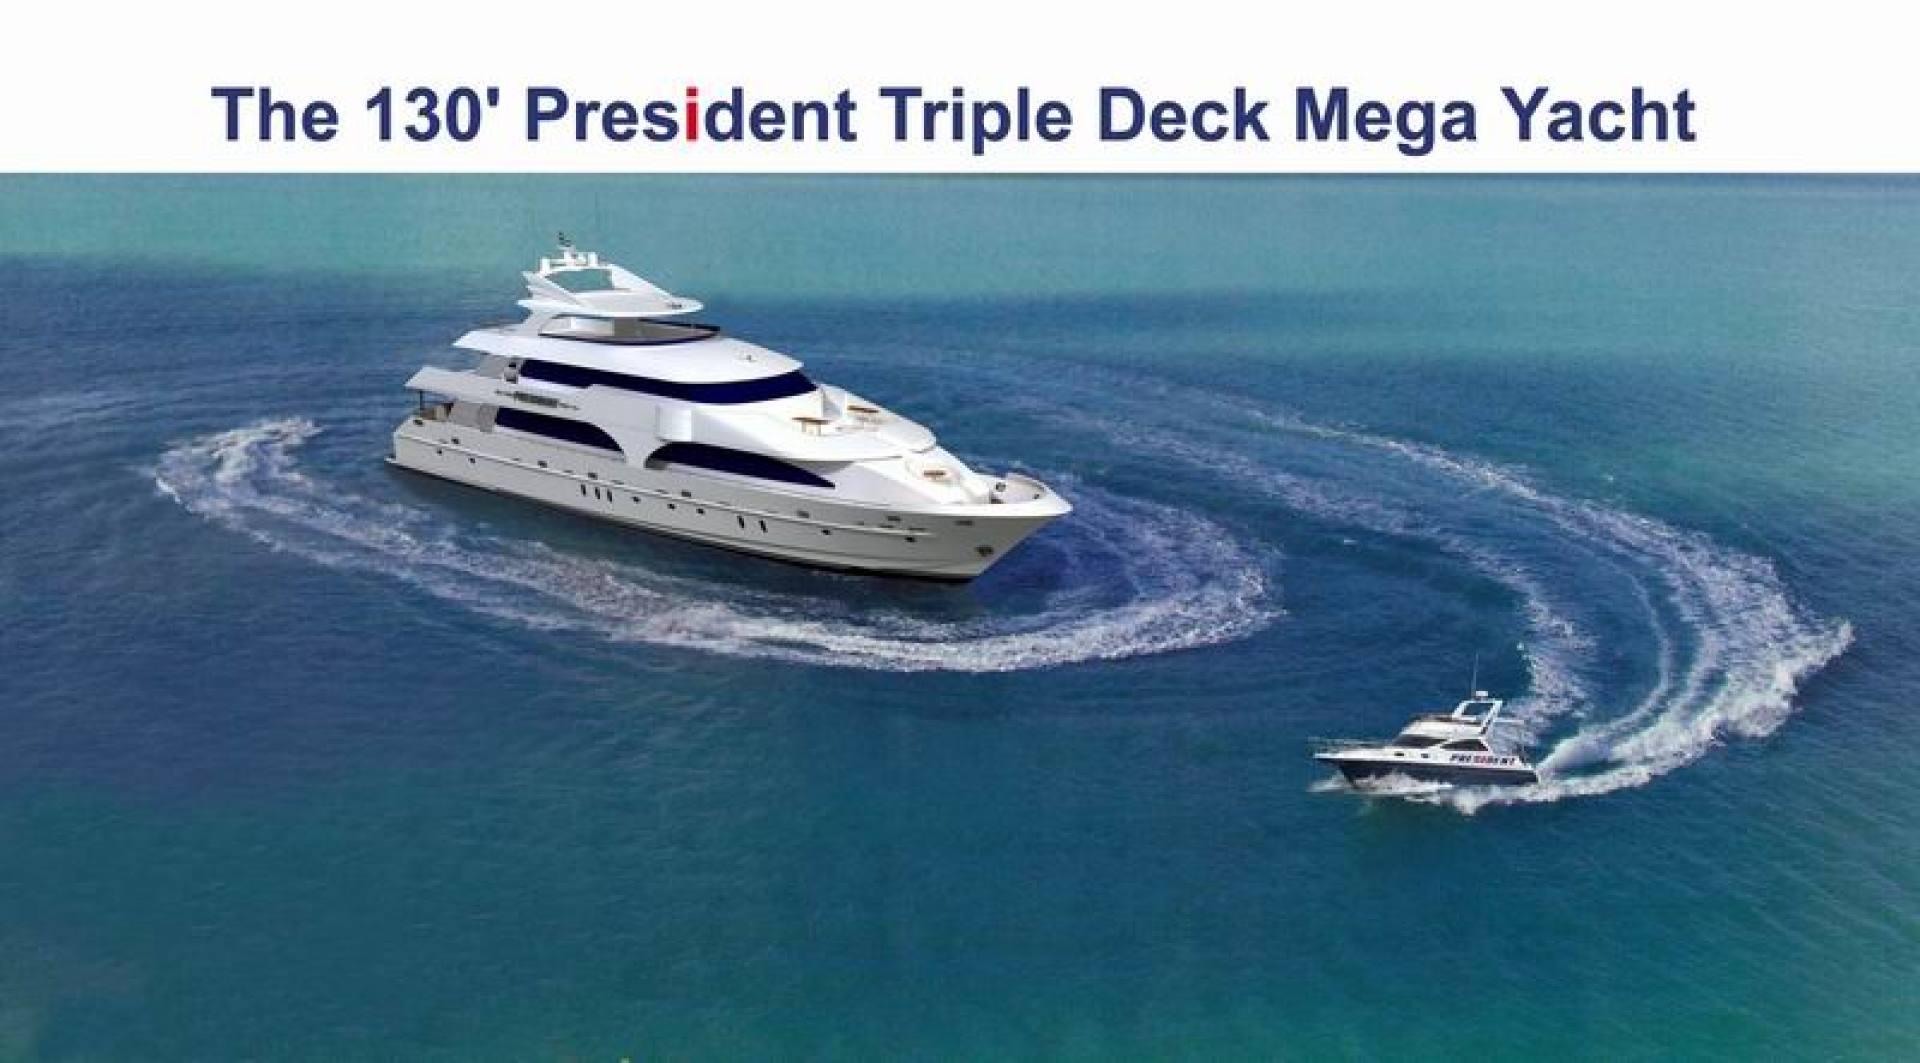 President-Triple Deck 2017-No Name FOB, Factory-Taiwan-610093 | Thumbnail